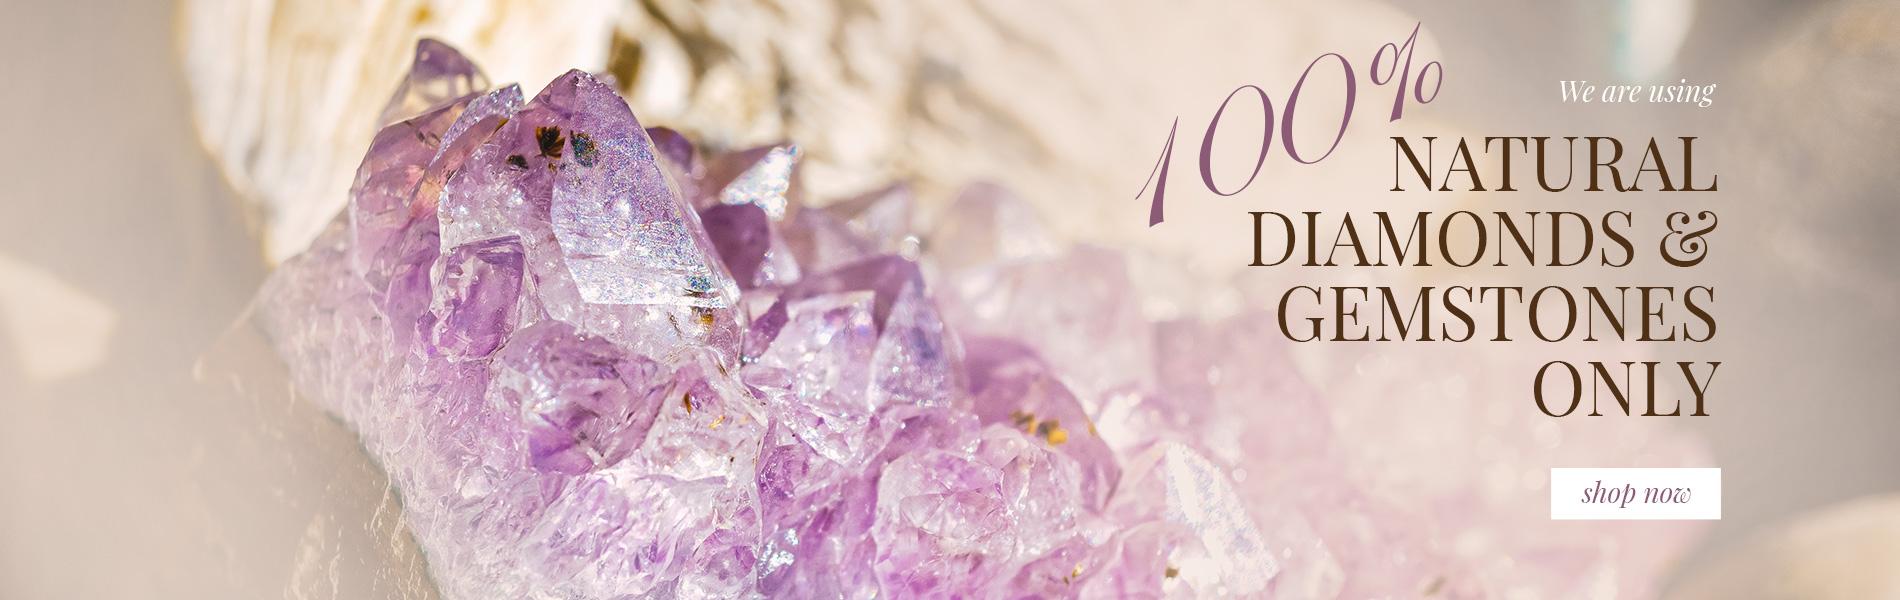 Natural Diamond & Gemstones